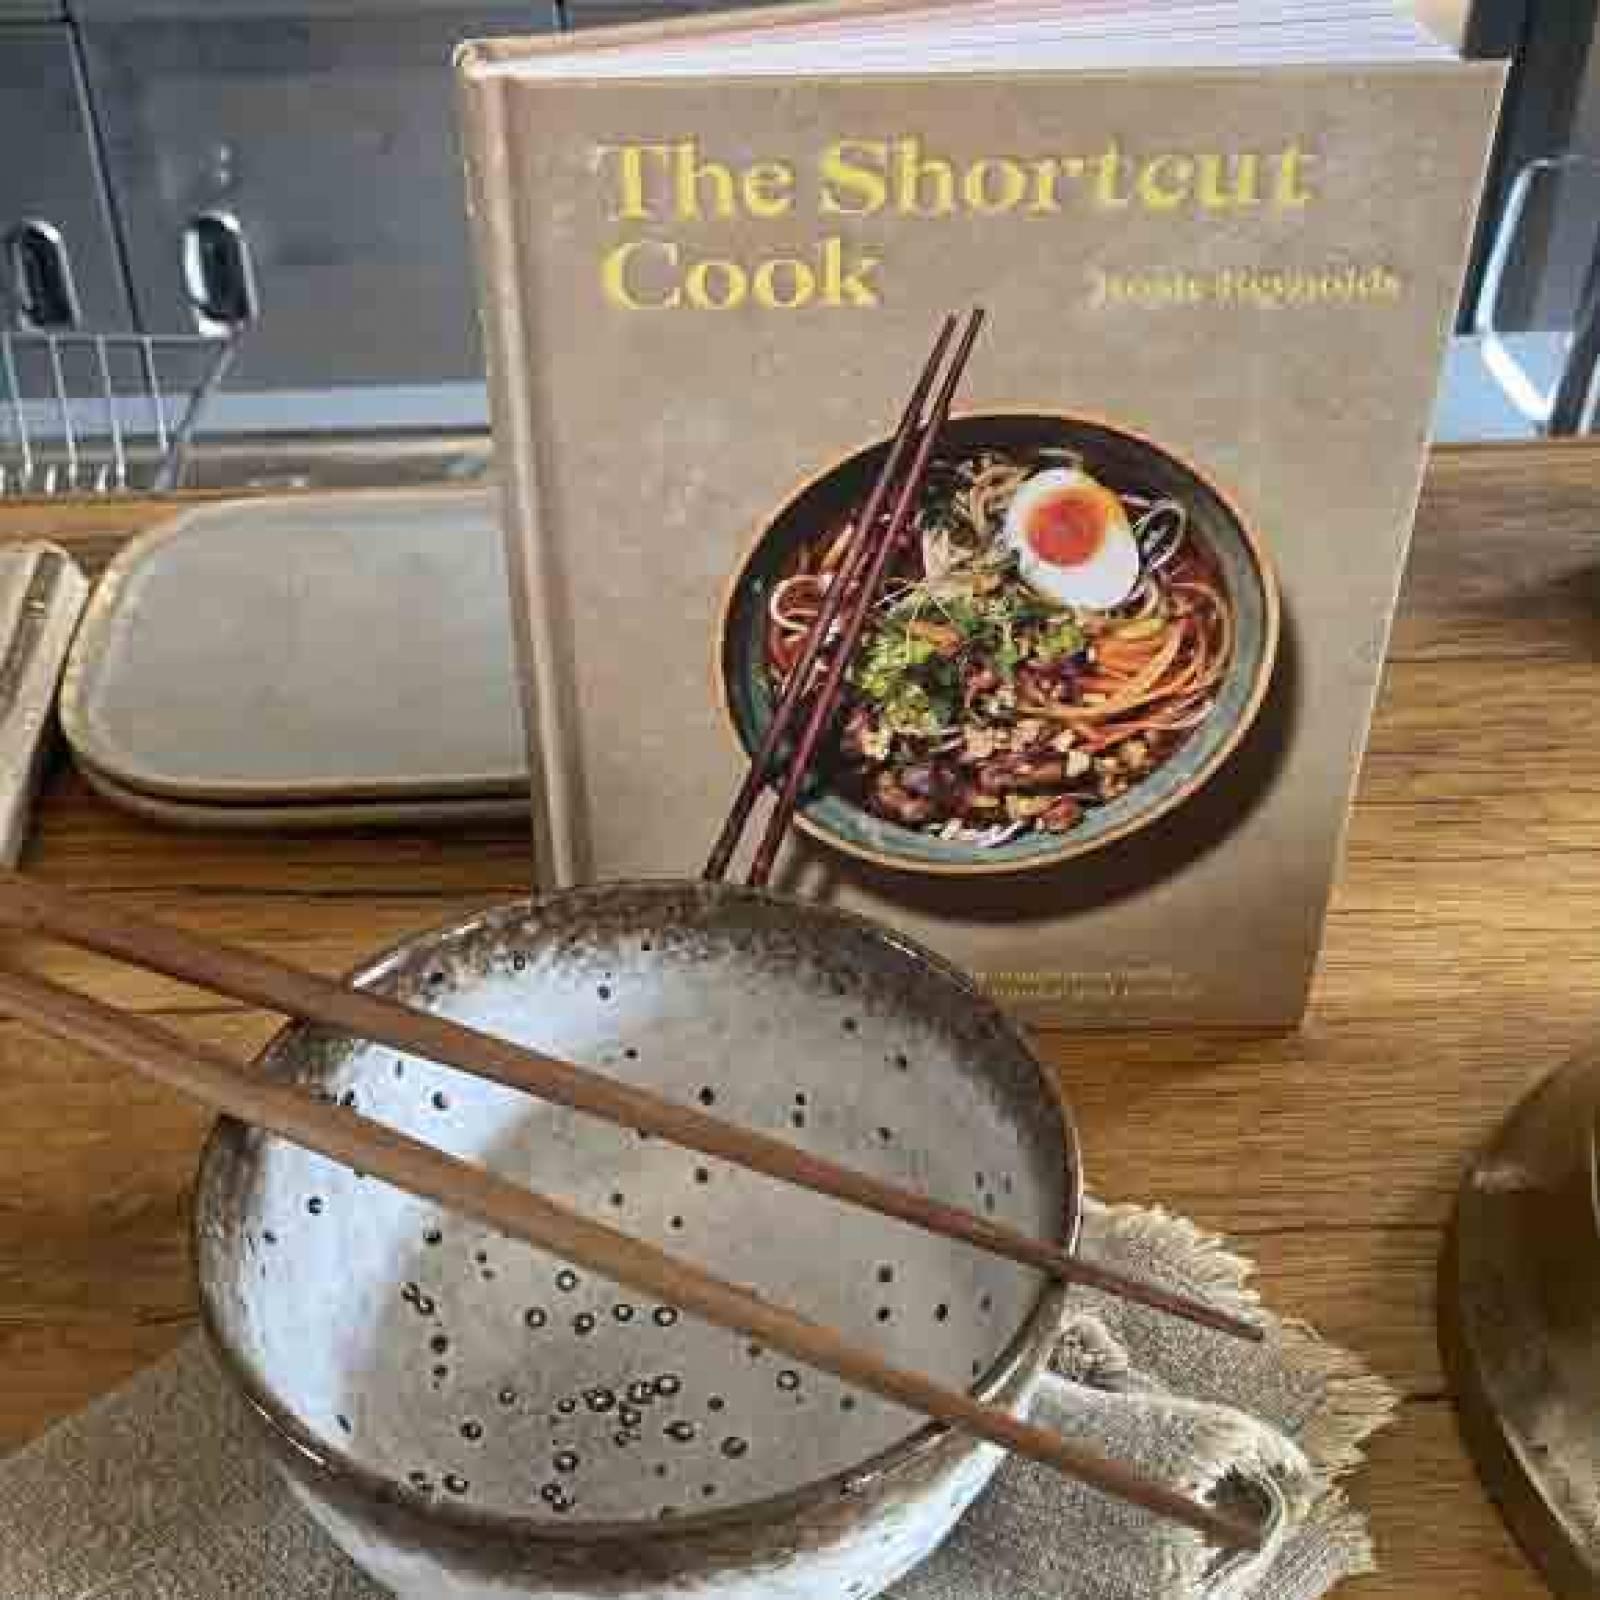 The Shortcut Cook - Hardback Book thumbnails